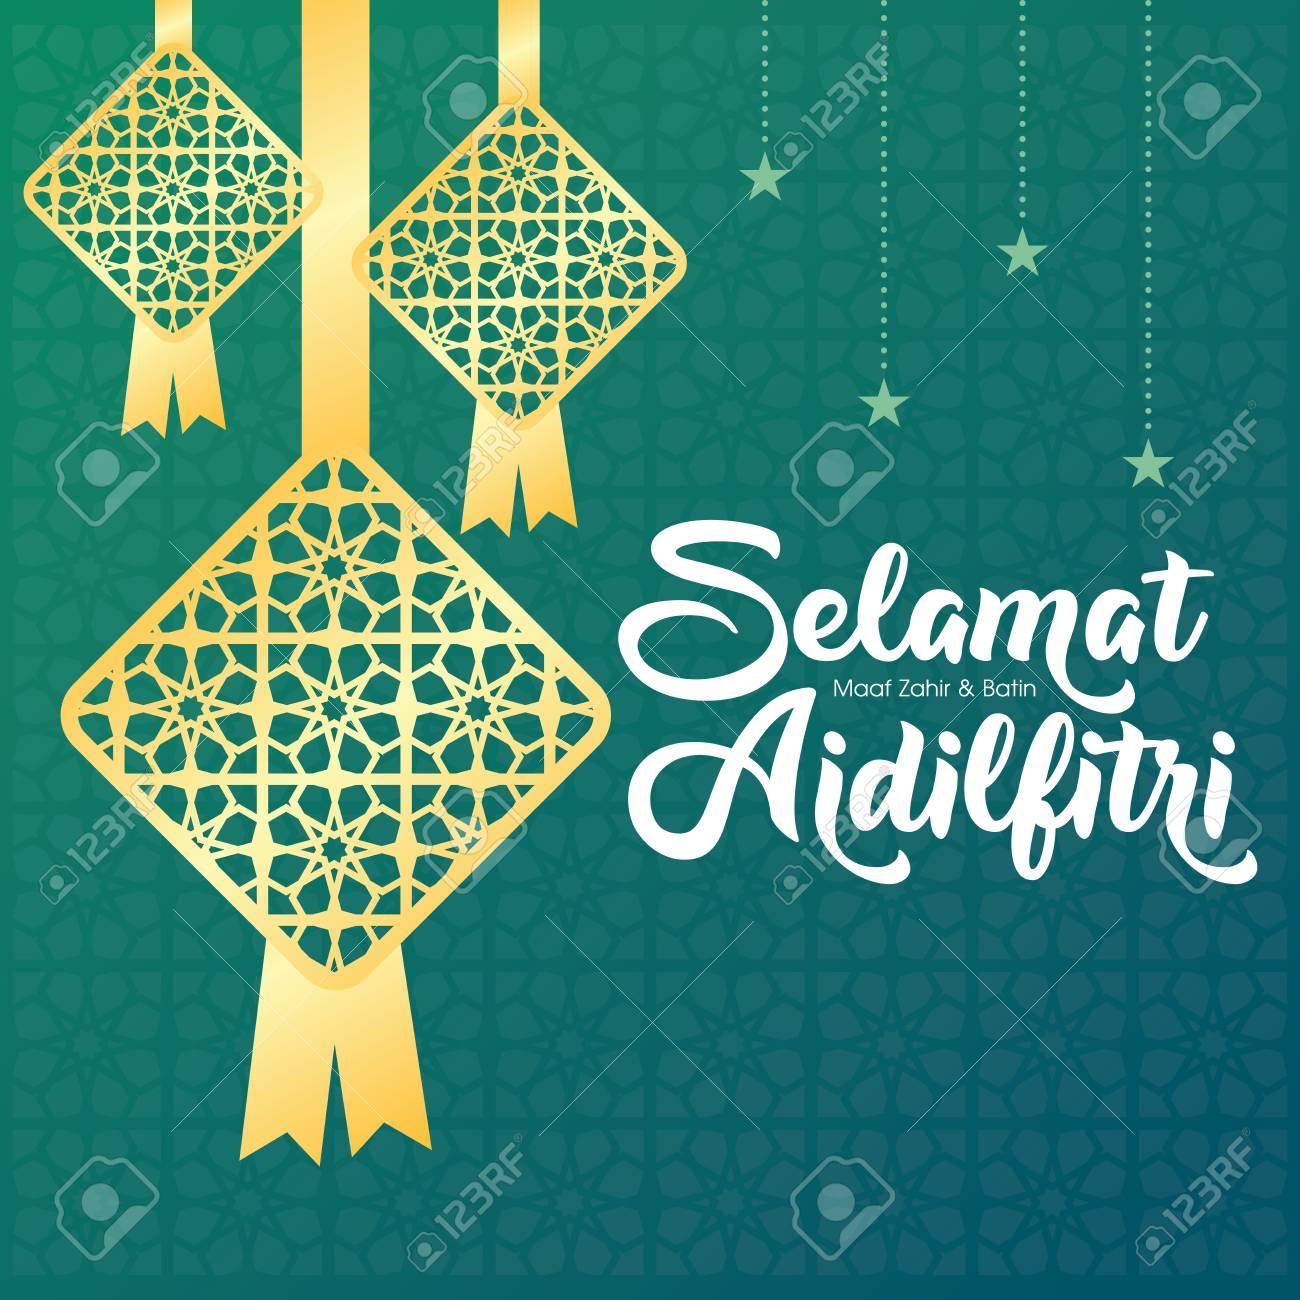 Selamat Hari Raya Aidilfitri greeting card vector illustration. (Caption: Fasting Day celebration also known as Eid al-Fitr) - 123315766